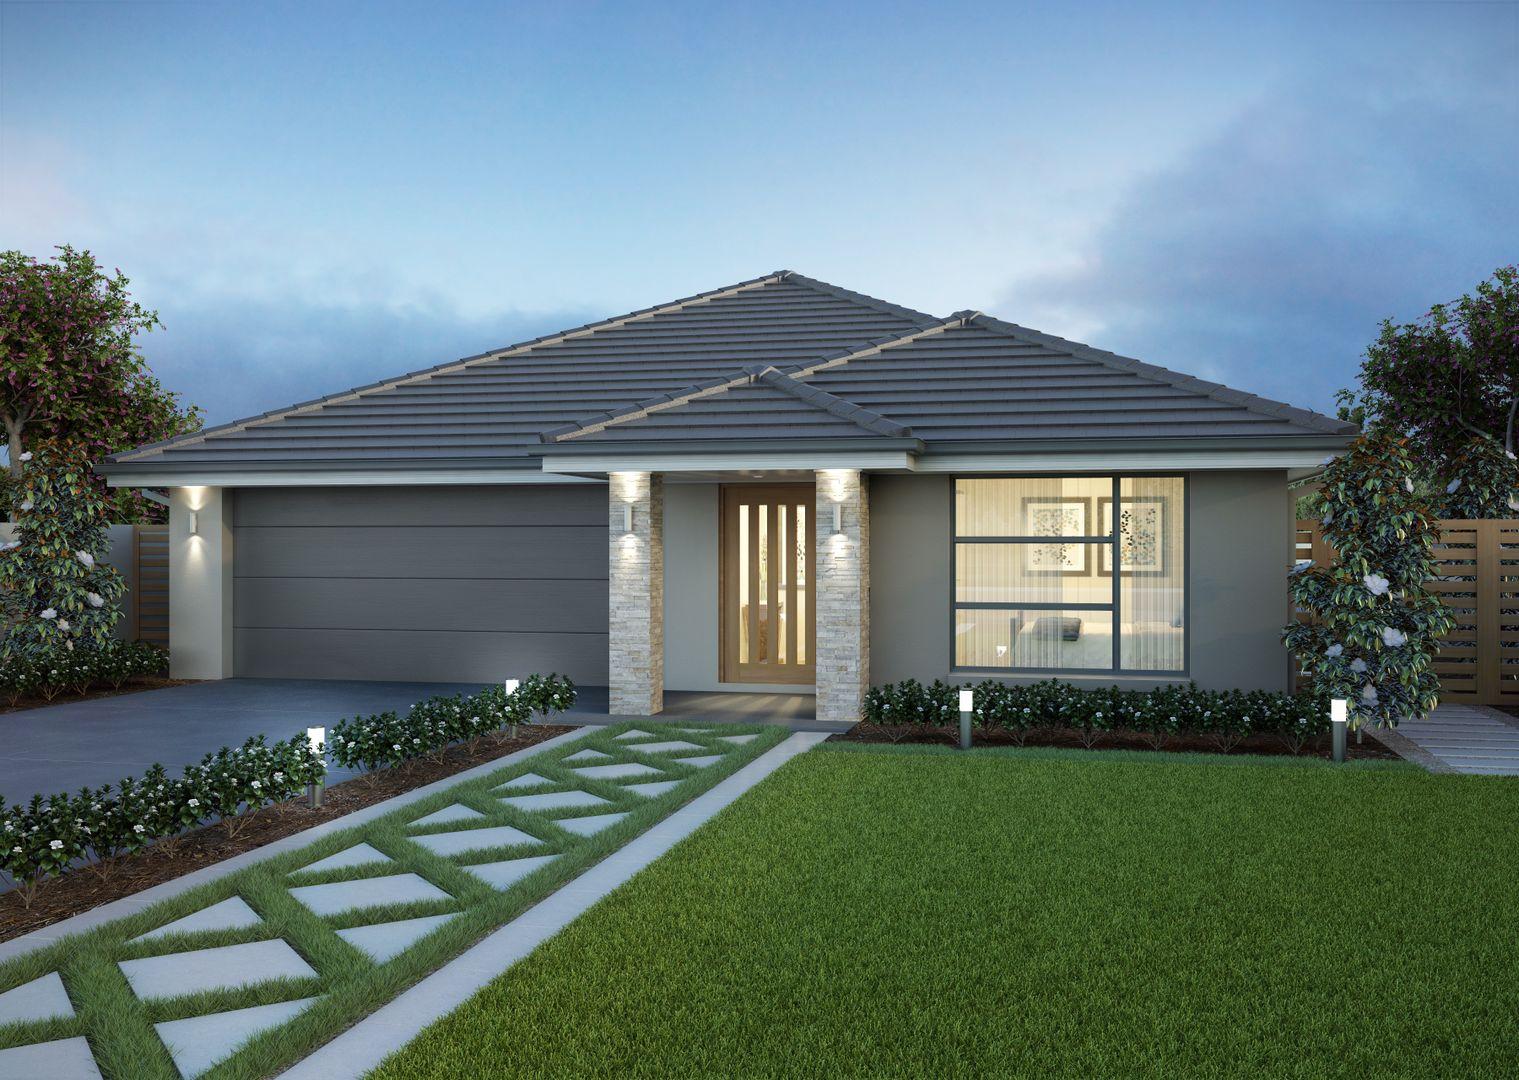 Lot 1 Marty Street, High Park Estate, Wynnum West QLD 4178, Image 0